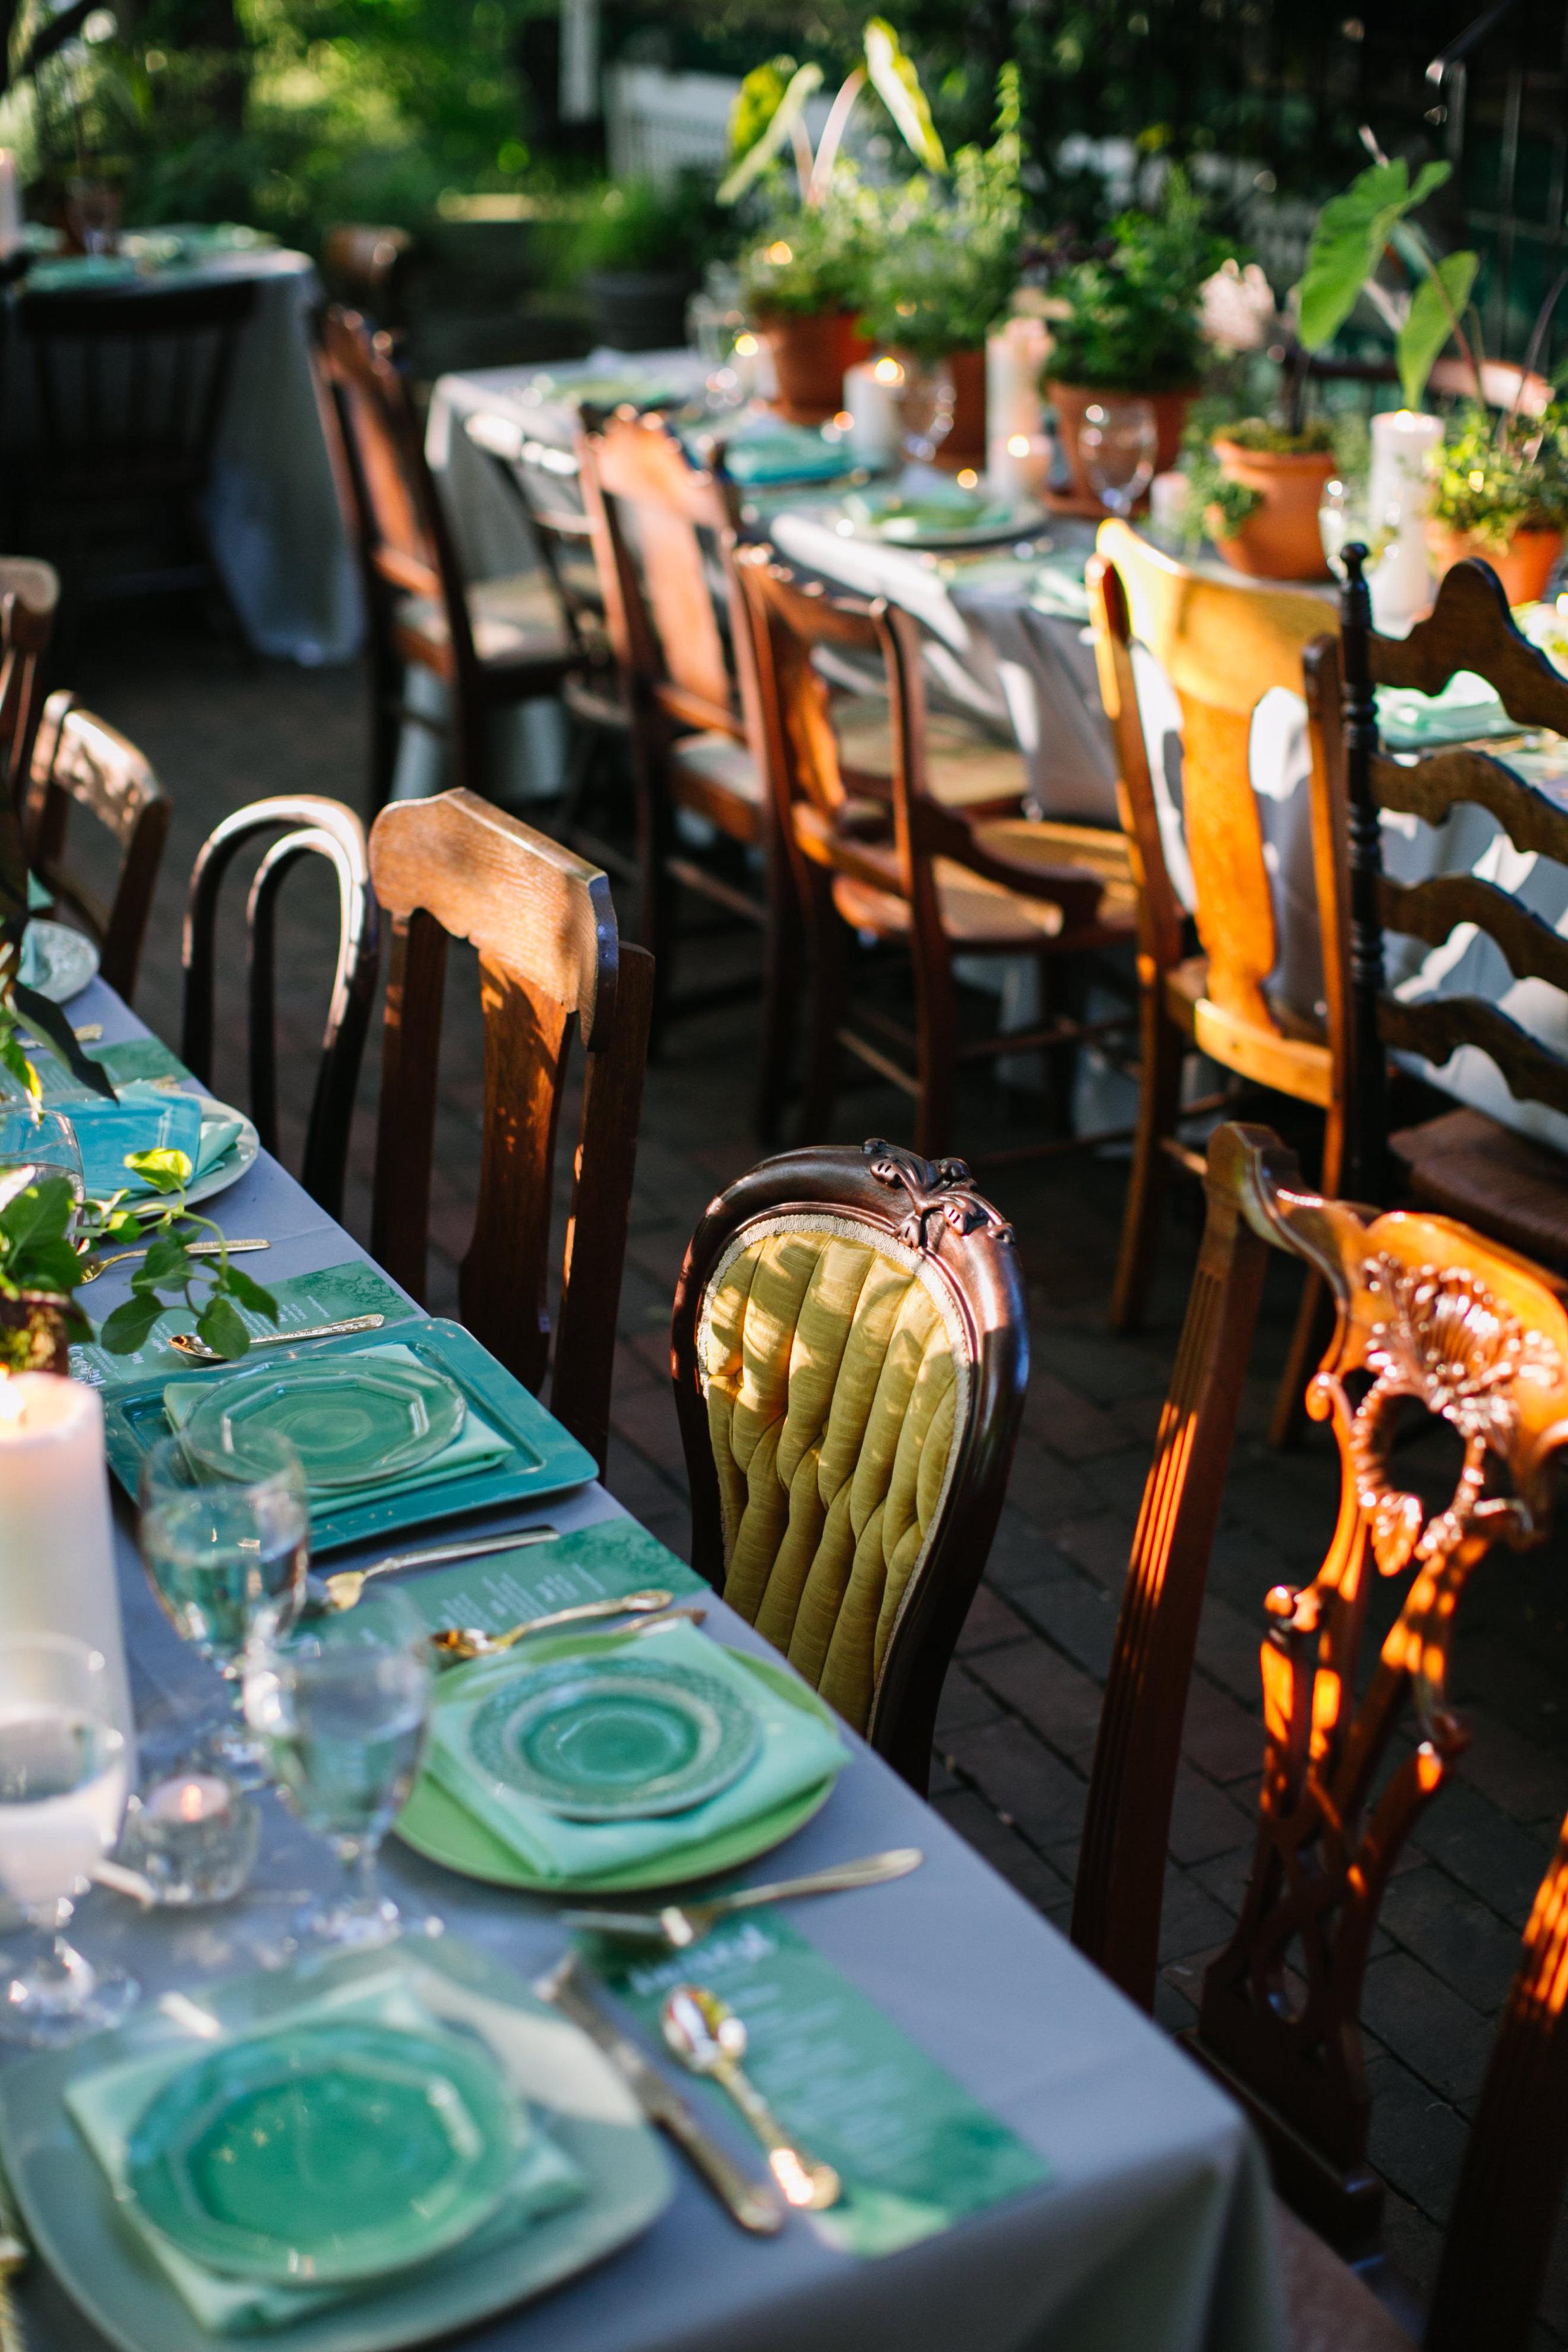 West-Chester-PA-Faunbrook-Harvest-Dinner-Series-Mint-BrittneyRaine-114.JPG